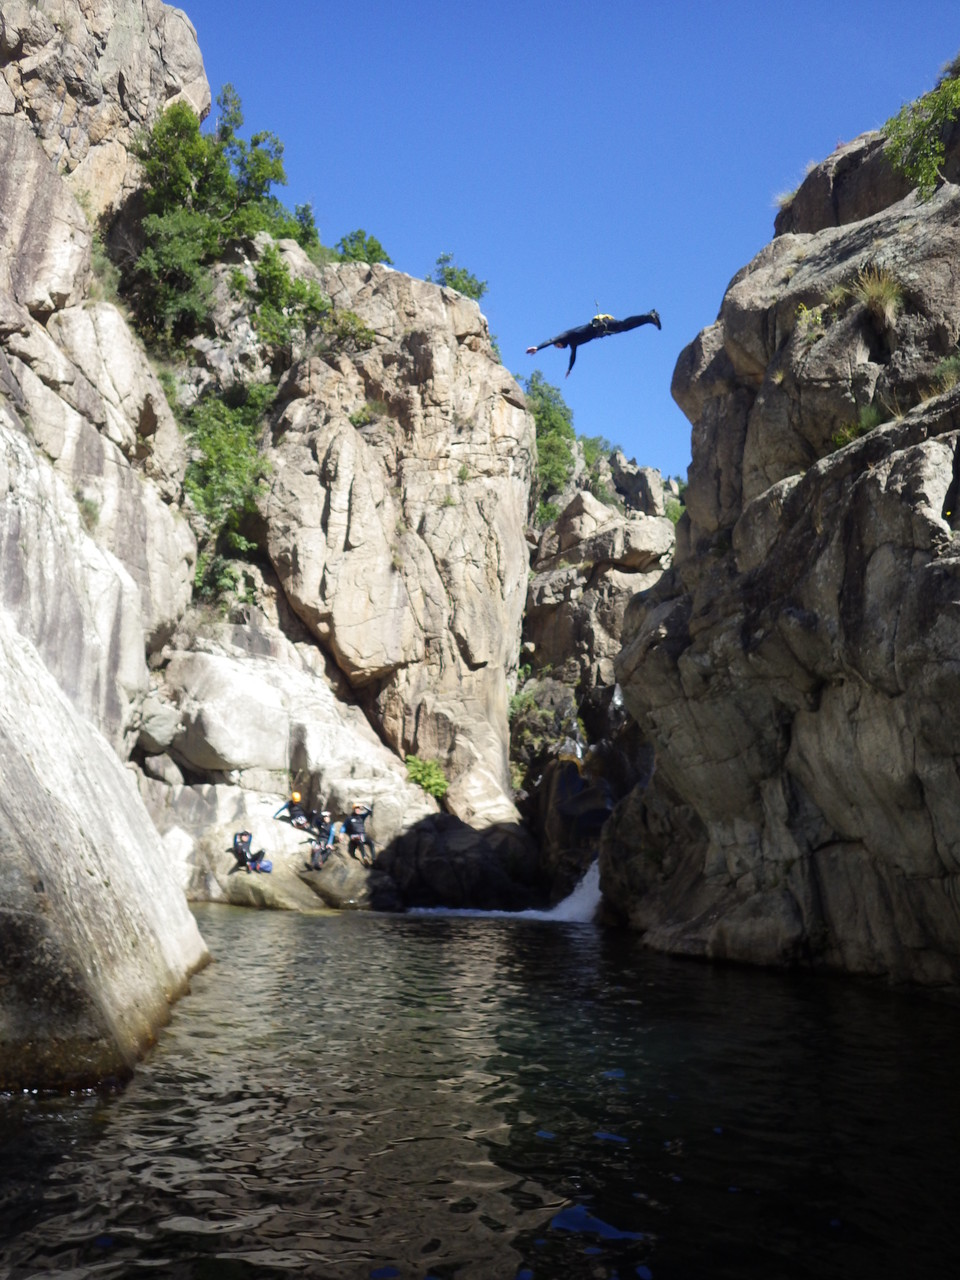 canyoning paradisiaques proches de lyon et grenoble